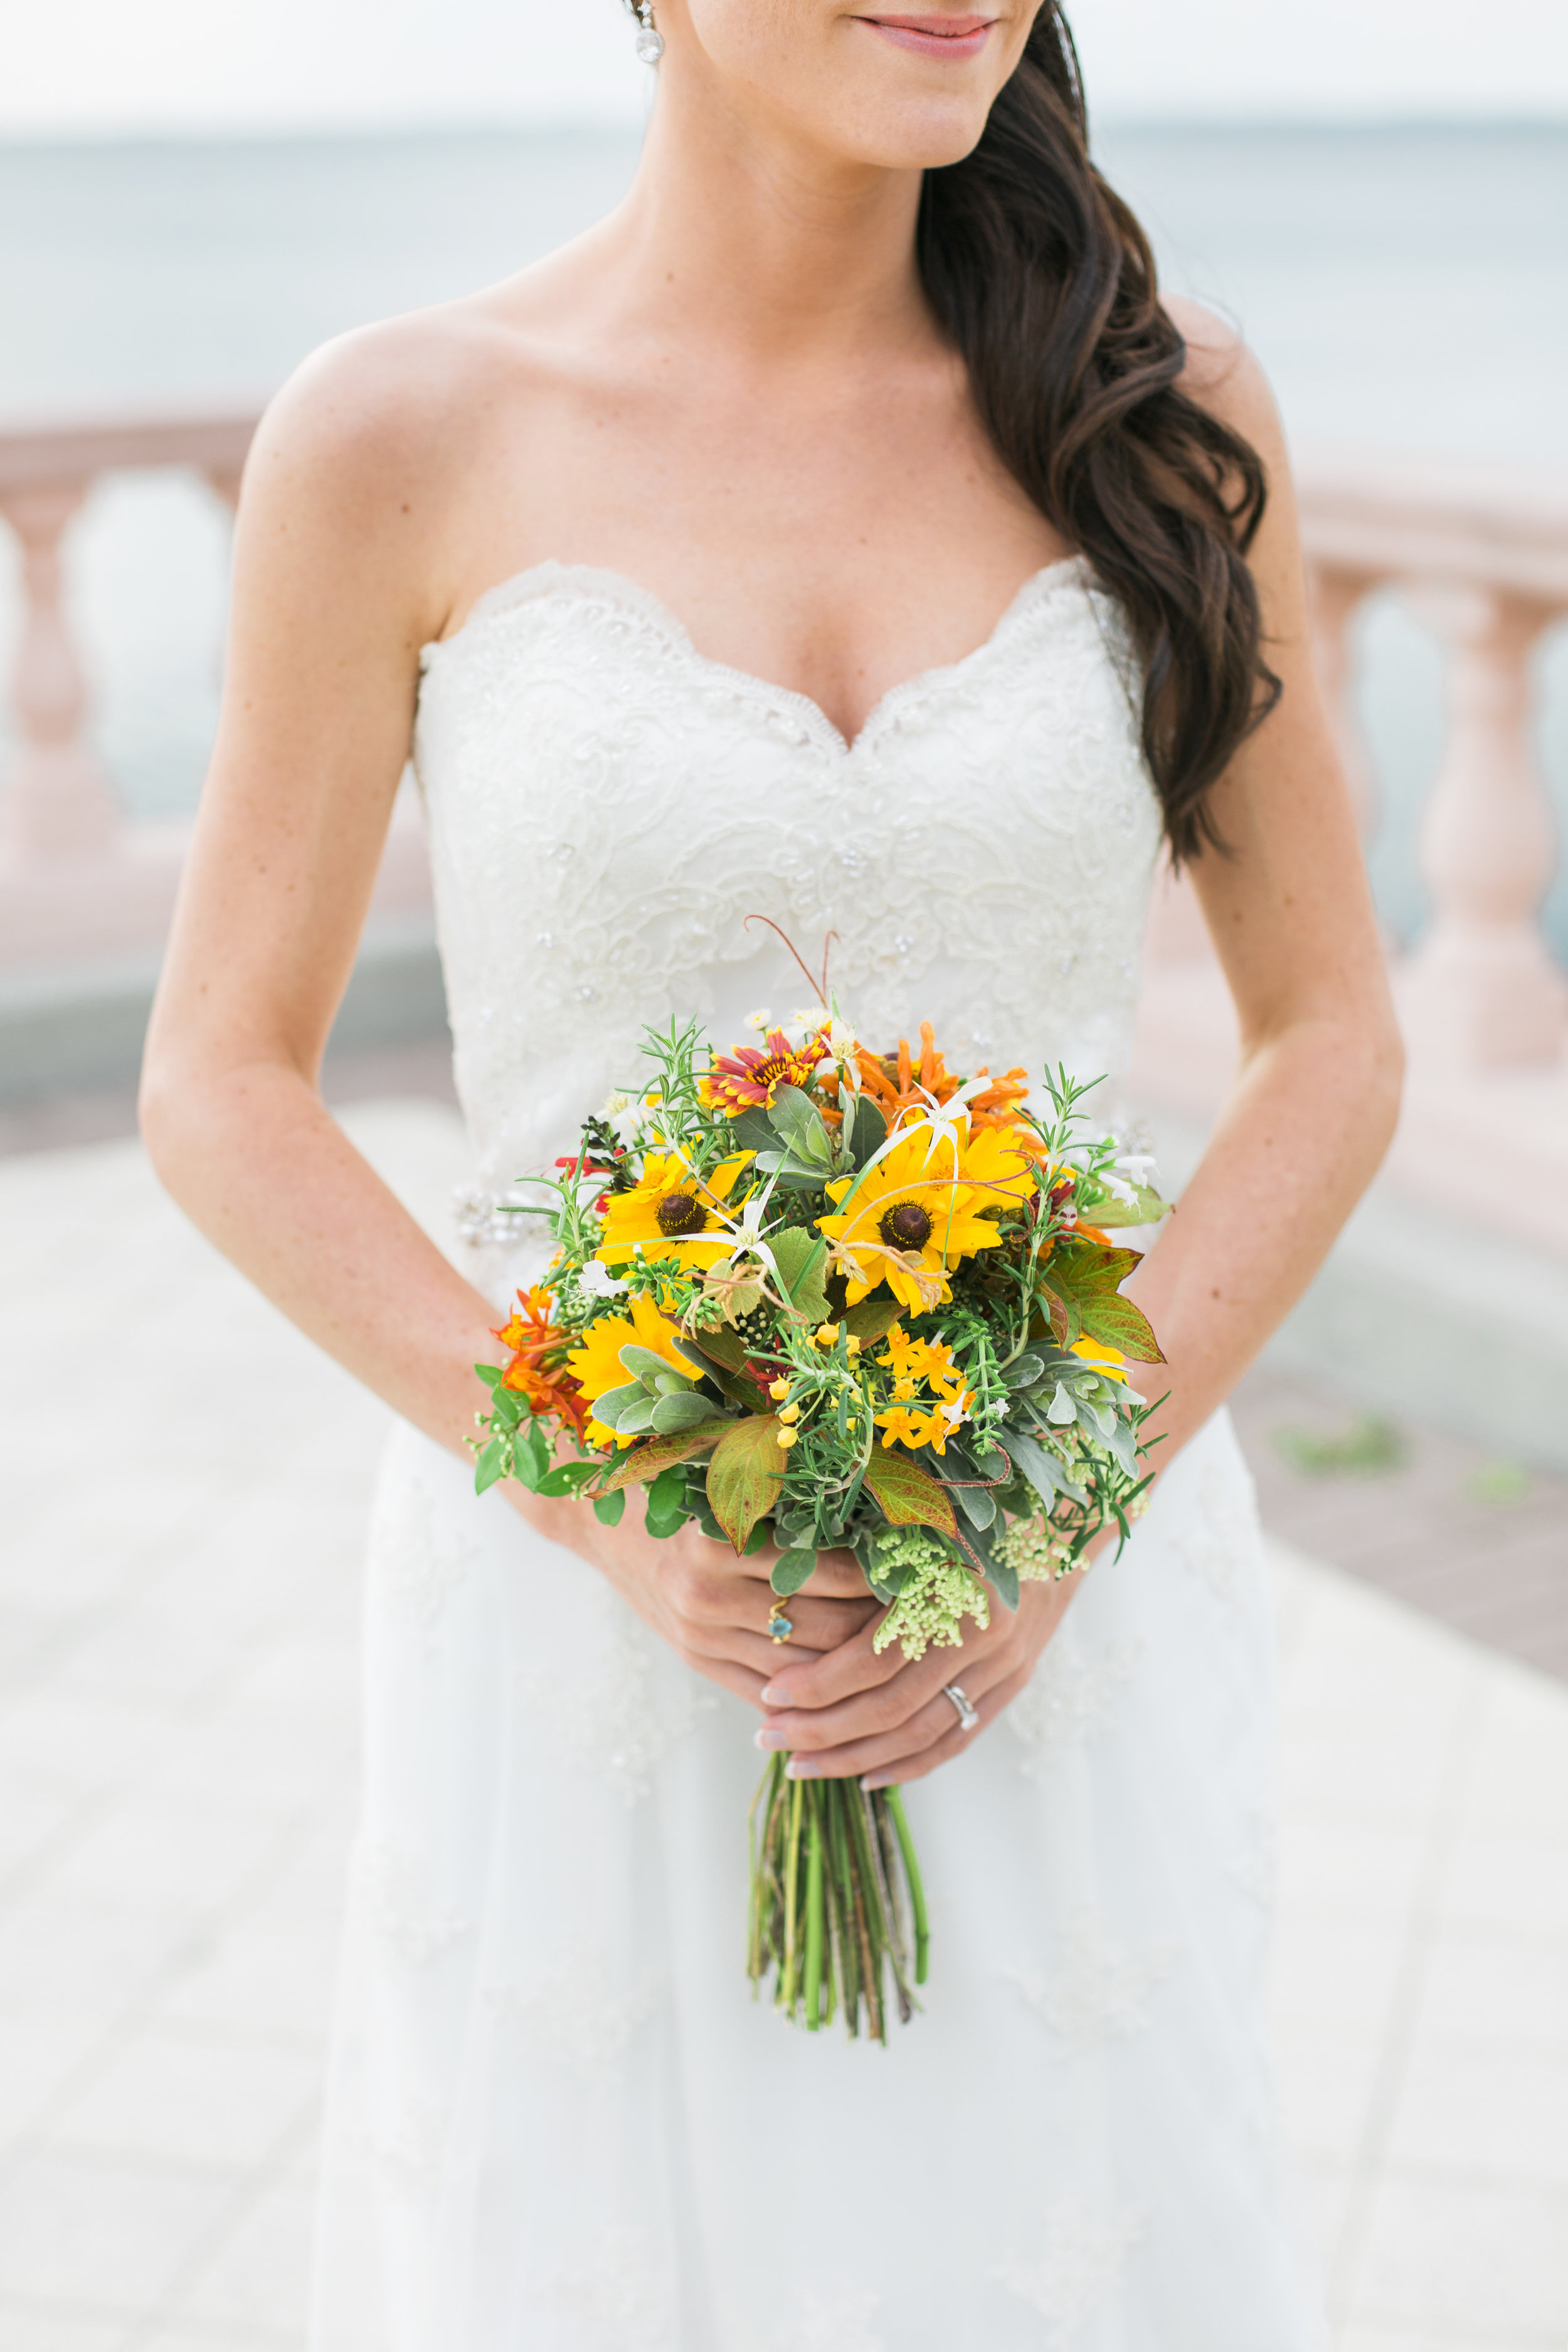 Rachel + Cole - Ringling Wedding Photography - Sarasota Wedding Photography - Emily & Co. Photography - 3. Couple (94).jpg